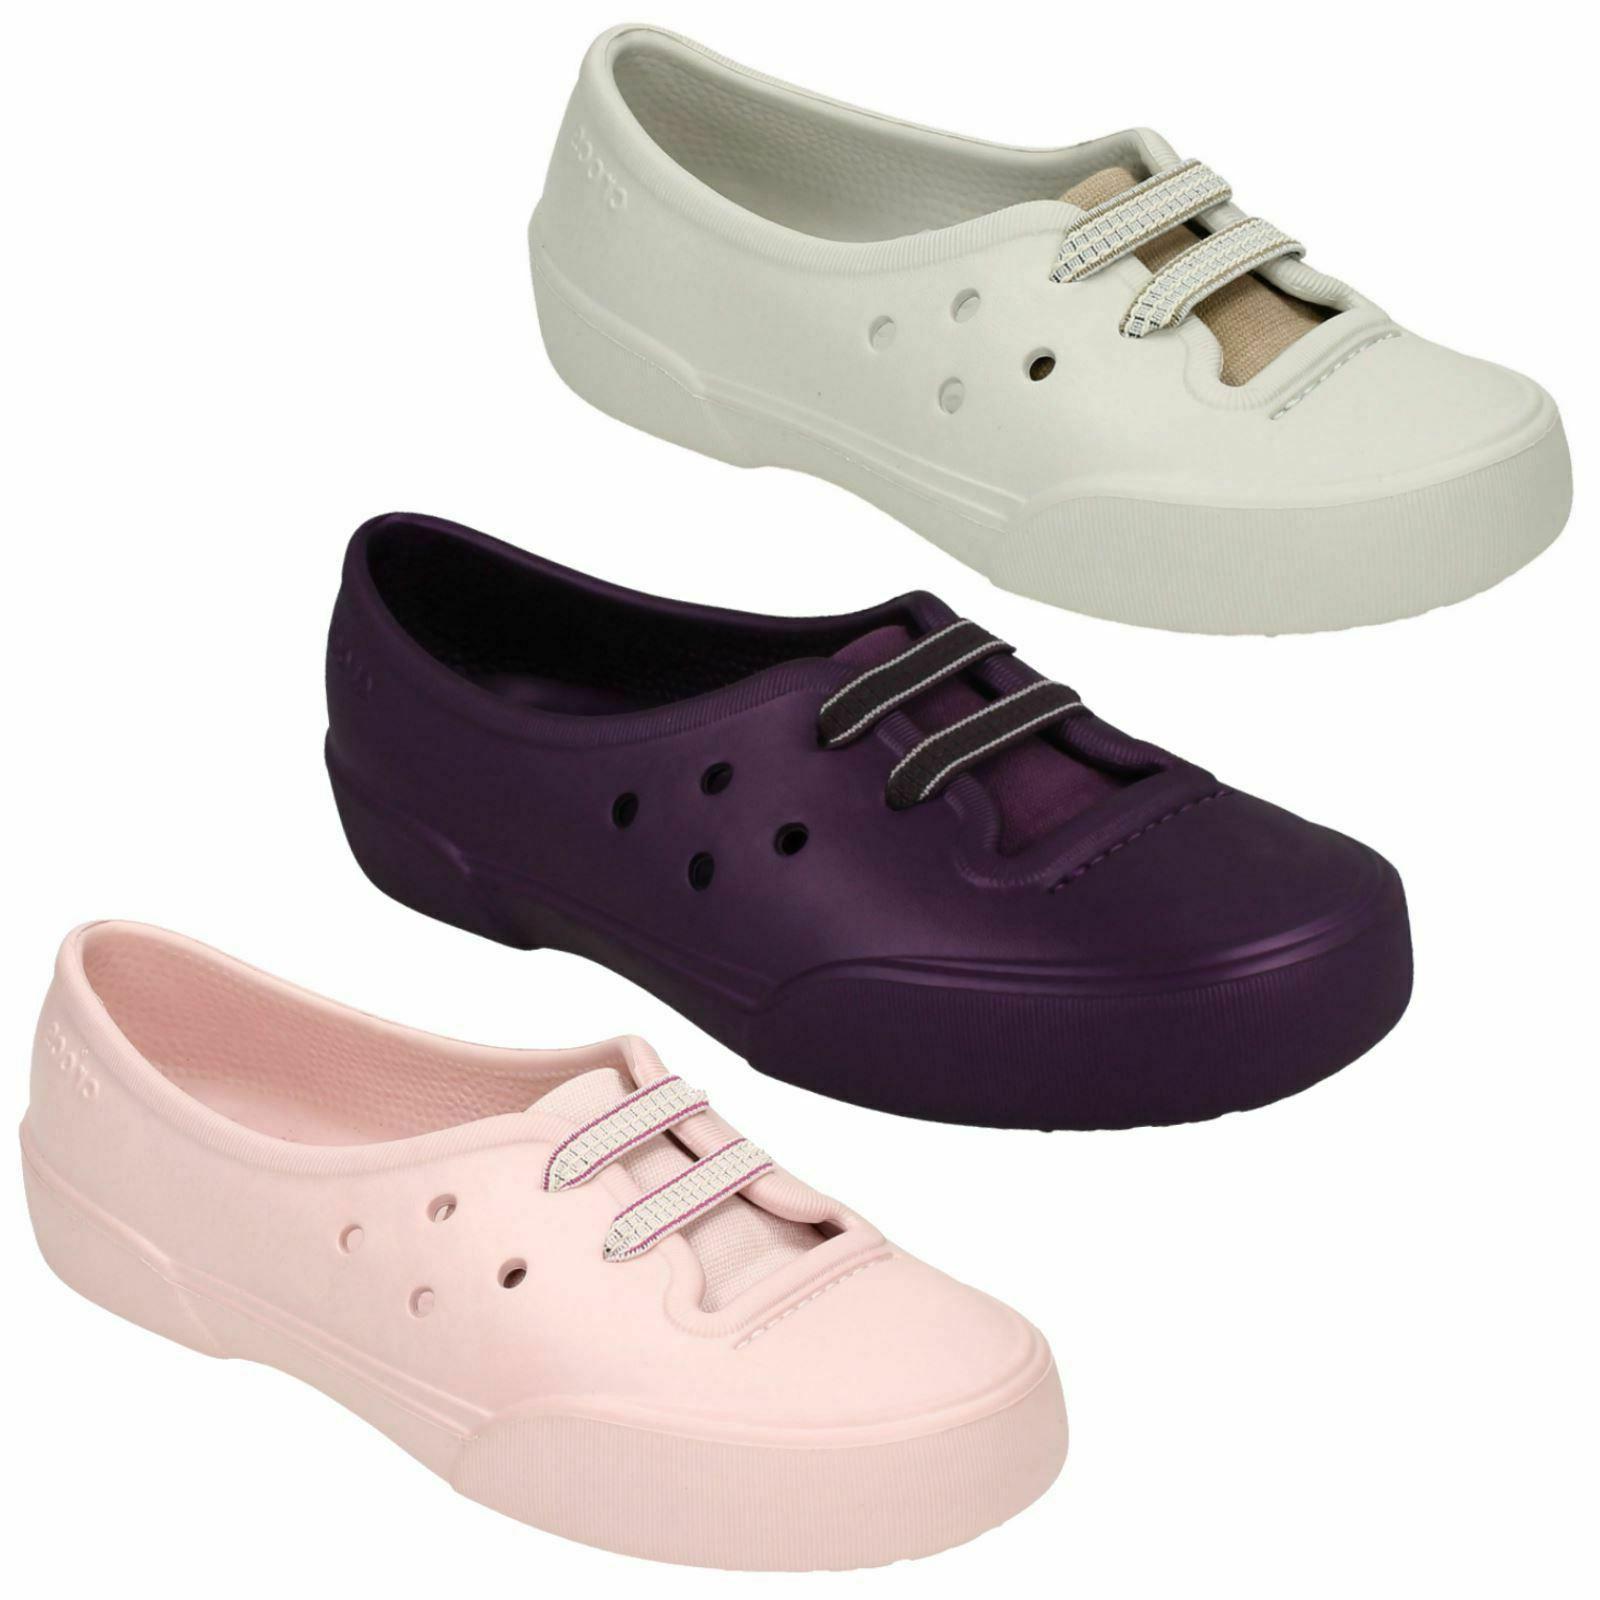 ladies slip on casual summer shoes nahani